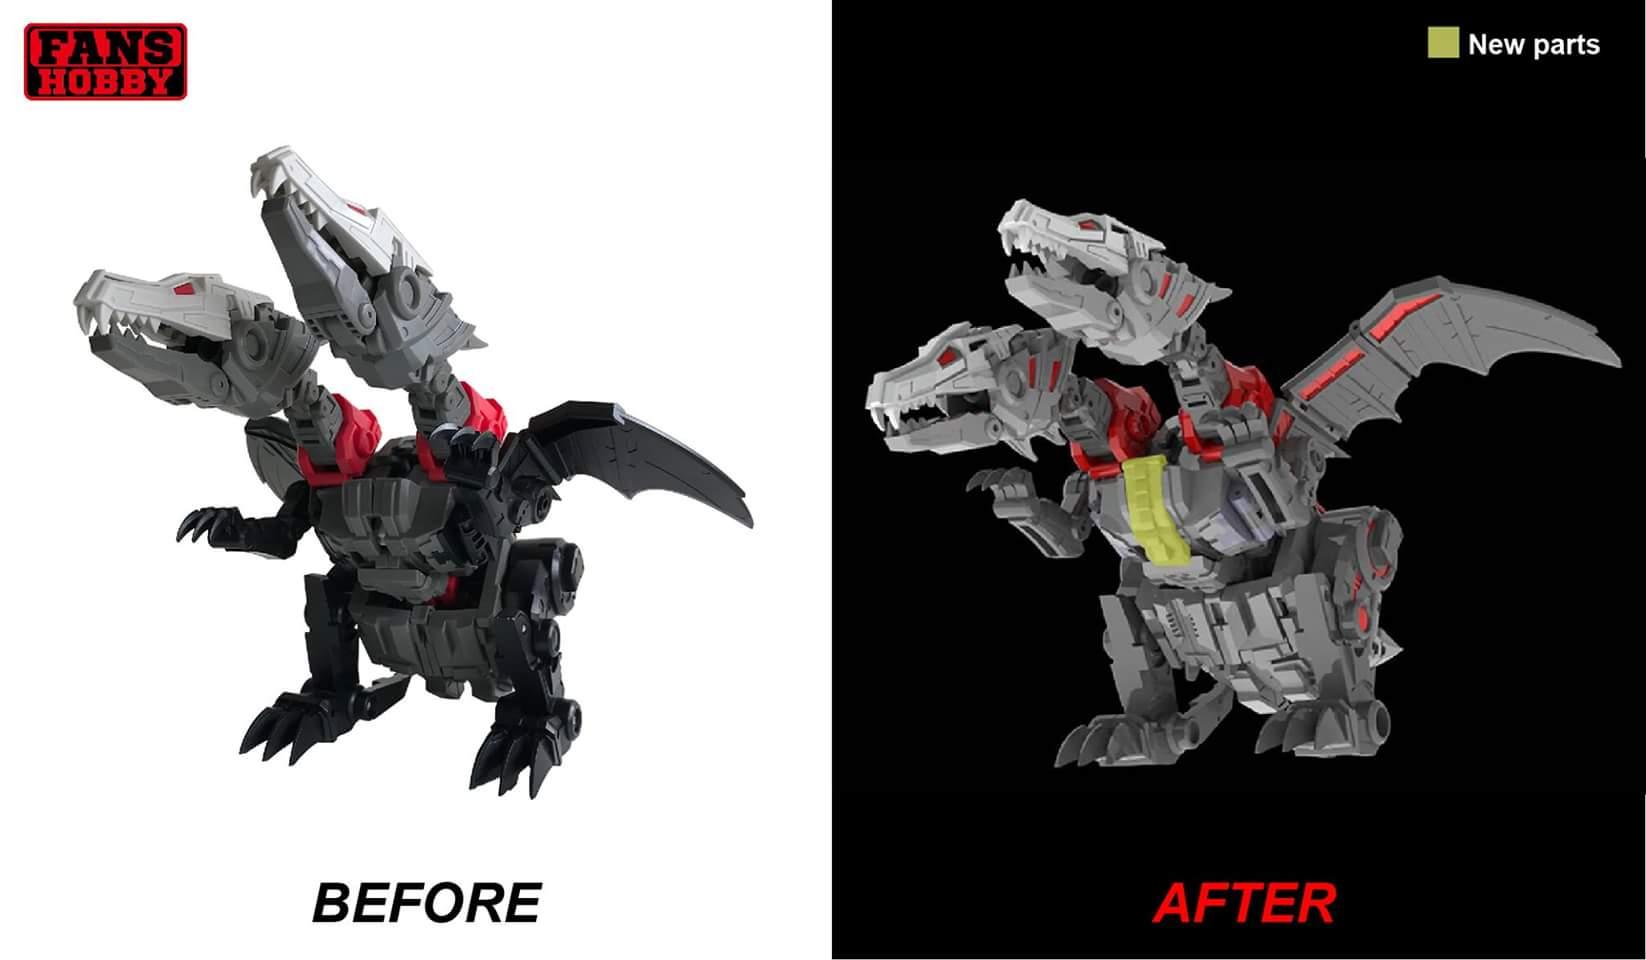 [FansHobby] Produit Tiers - Master Builder MB-02/03/05 - aka Monsterbots/Monstrebots - Page 2 I564LkUd